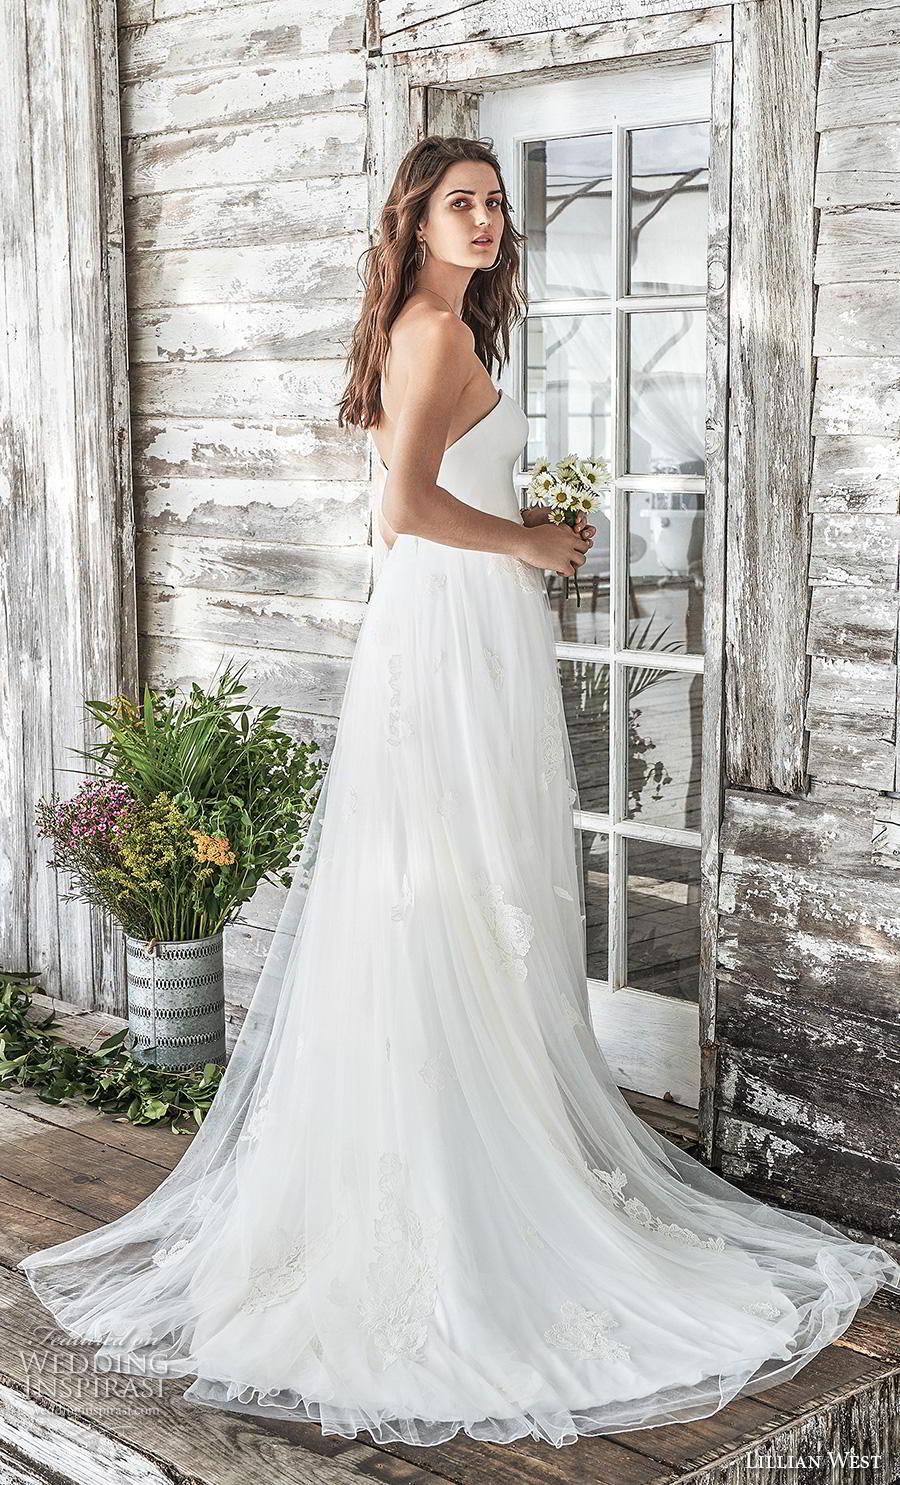 lillian west spring 2019 bridal strapless sweetheart neckline tulle skirt simple classic romantic a  line wedding dress mid back chapel train (9) bv